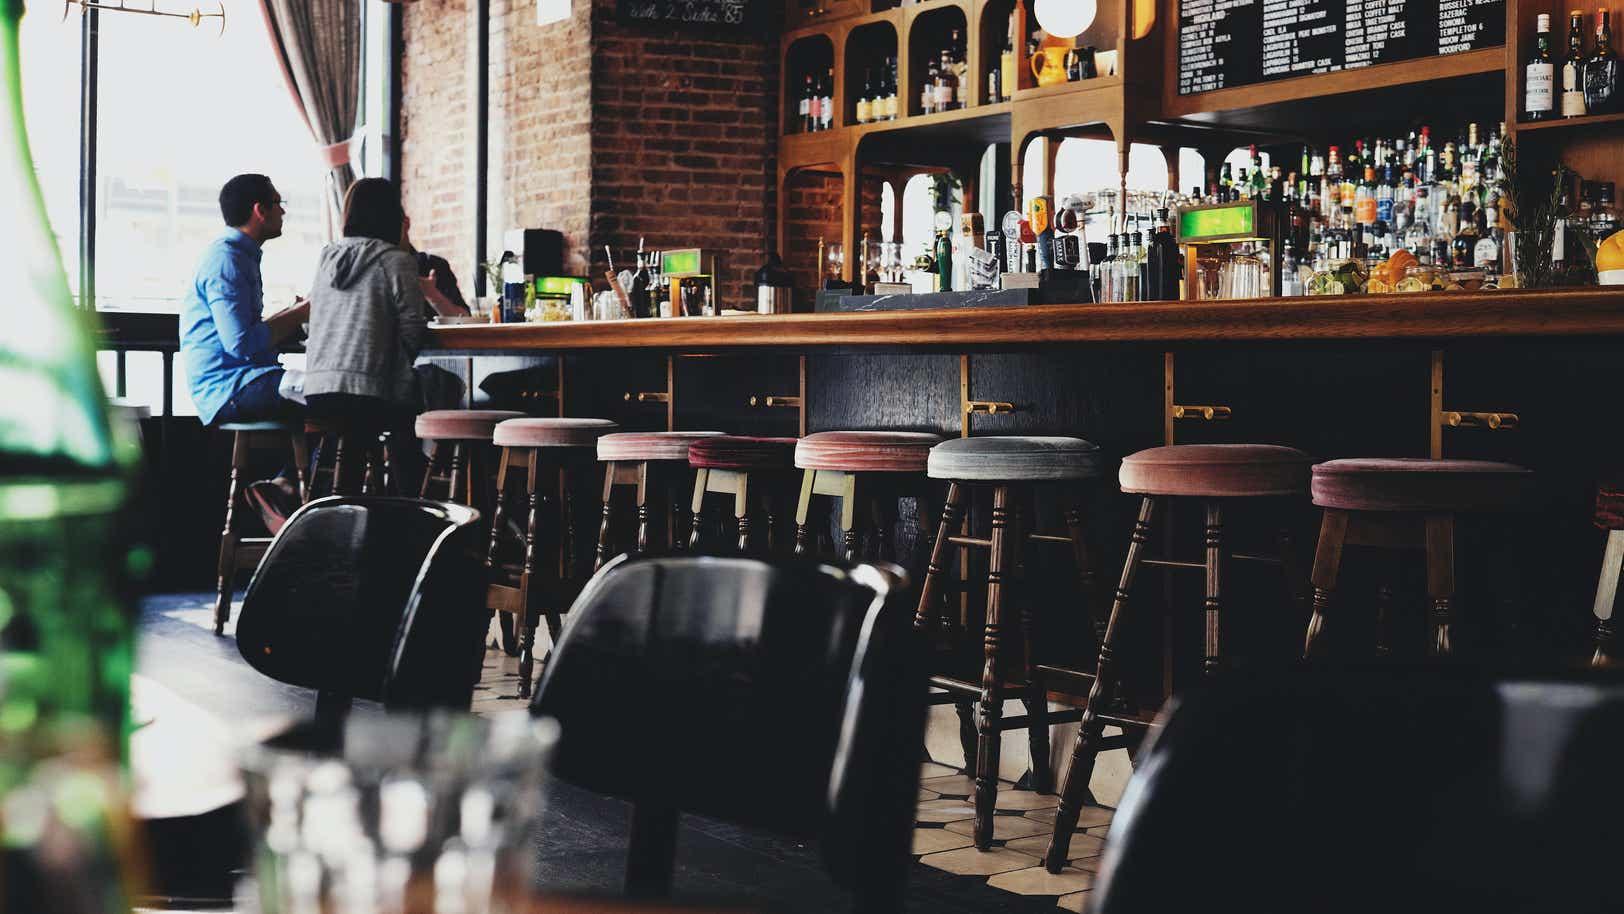 Bar Business Names